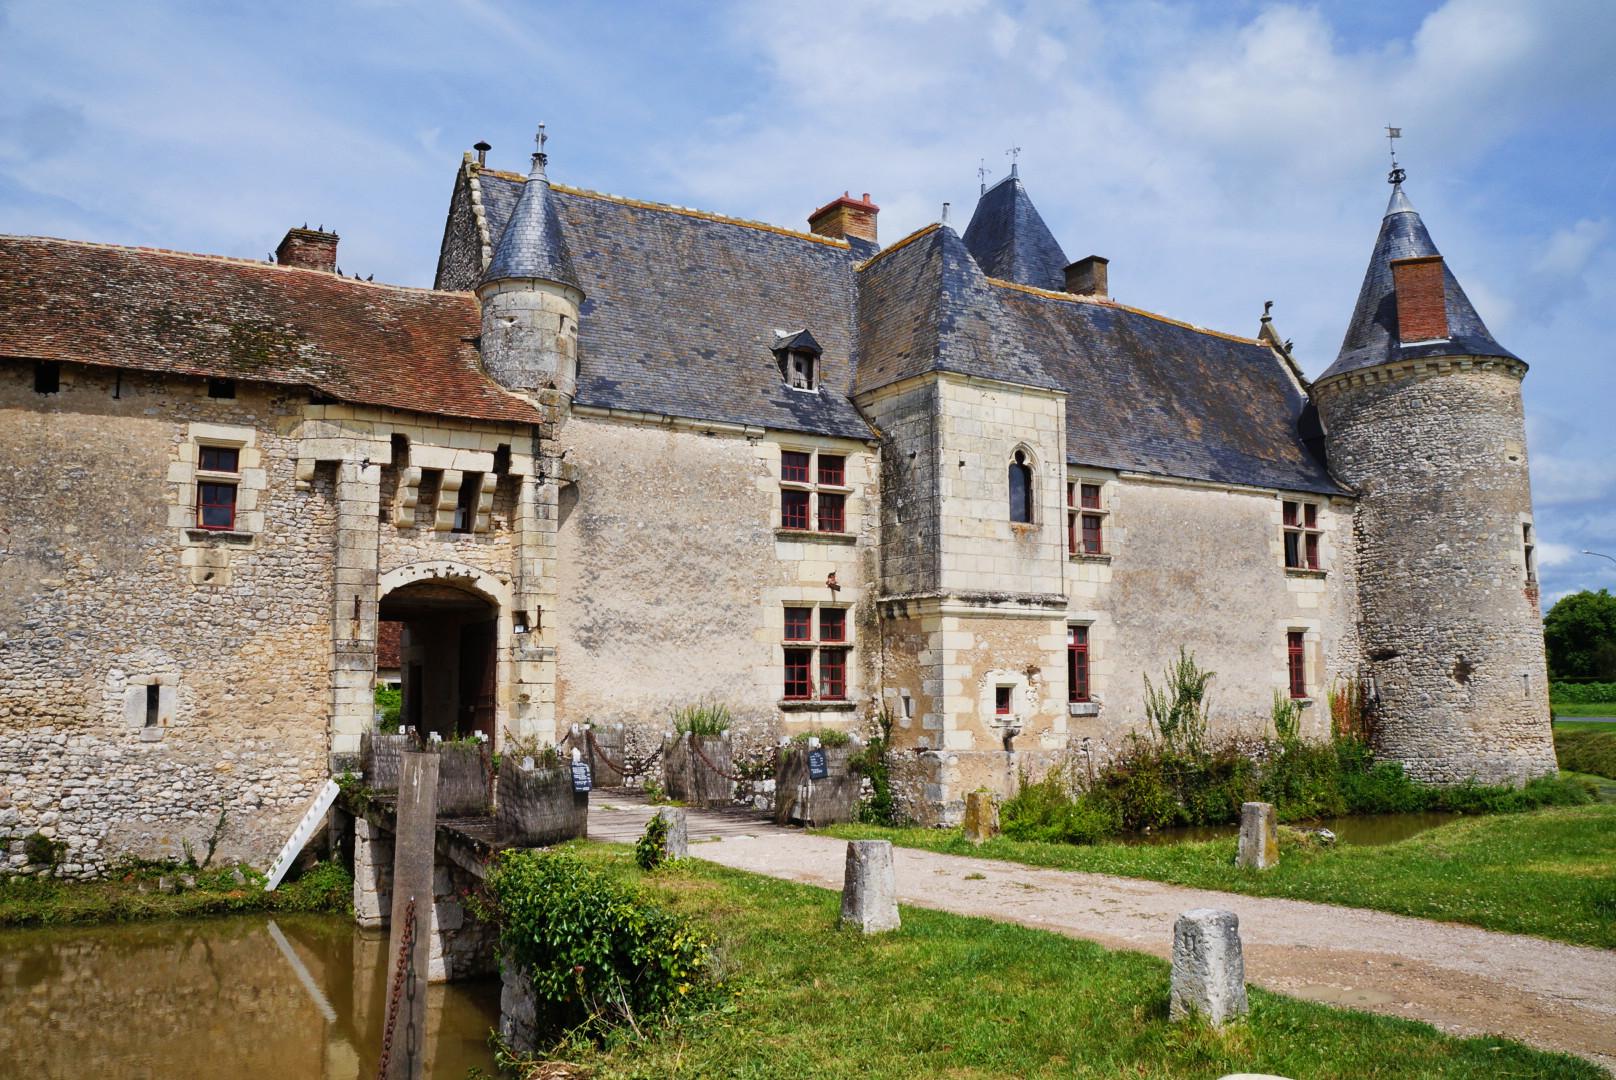 391-chateau_de_chemery.jpg